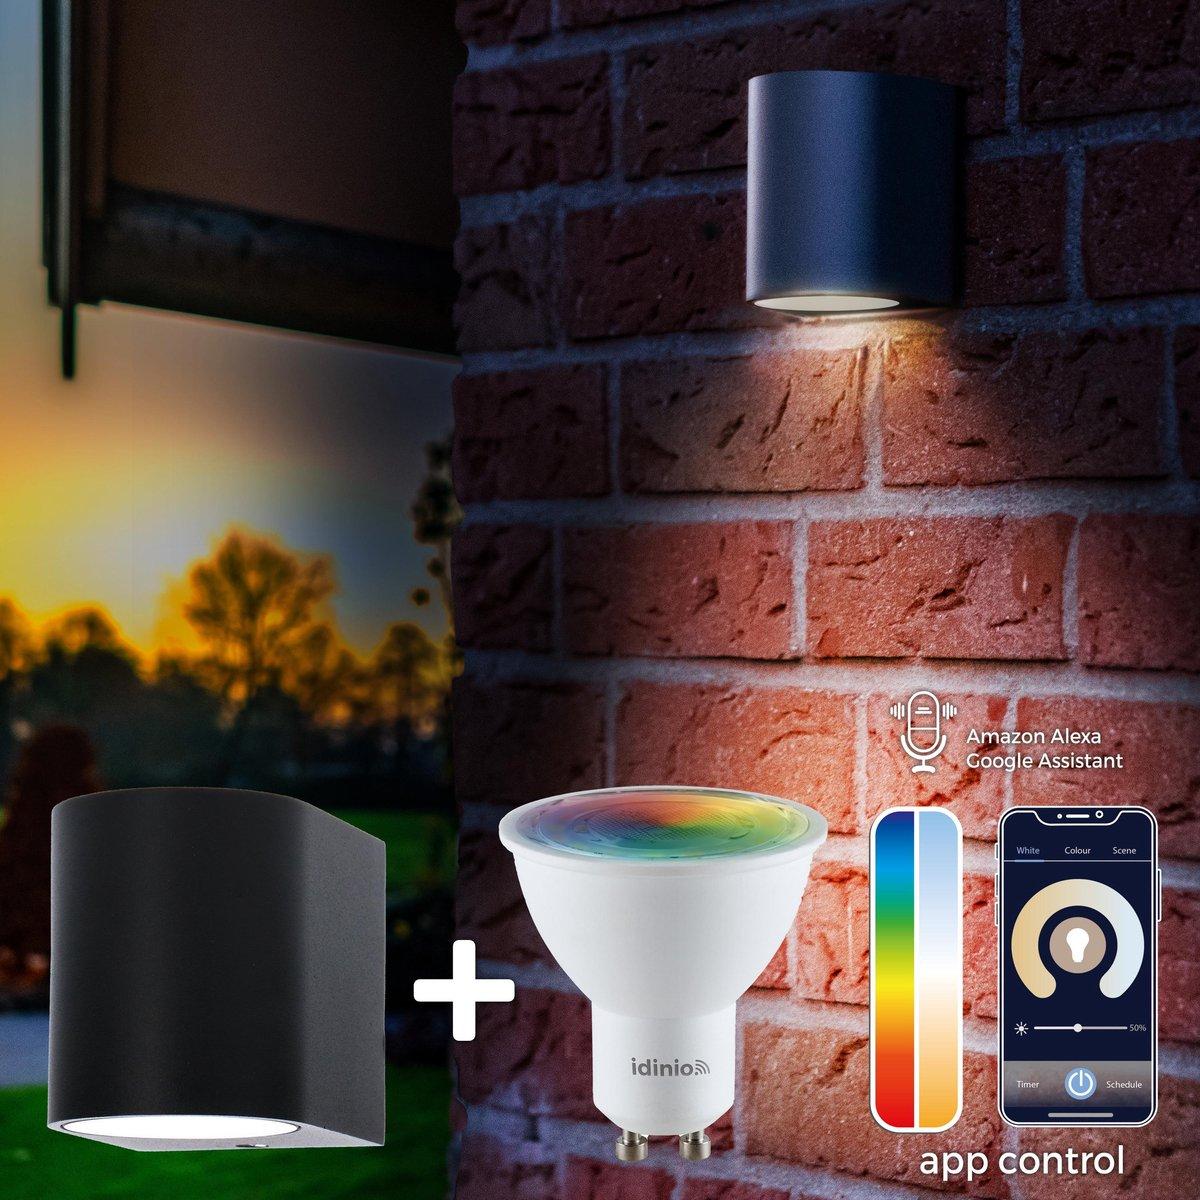 Proventa Slimme buitenlamp - Wandlamp Model J - White & Color - 1 x LED Muurlamp